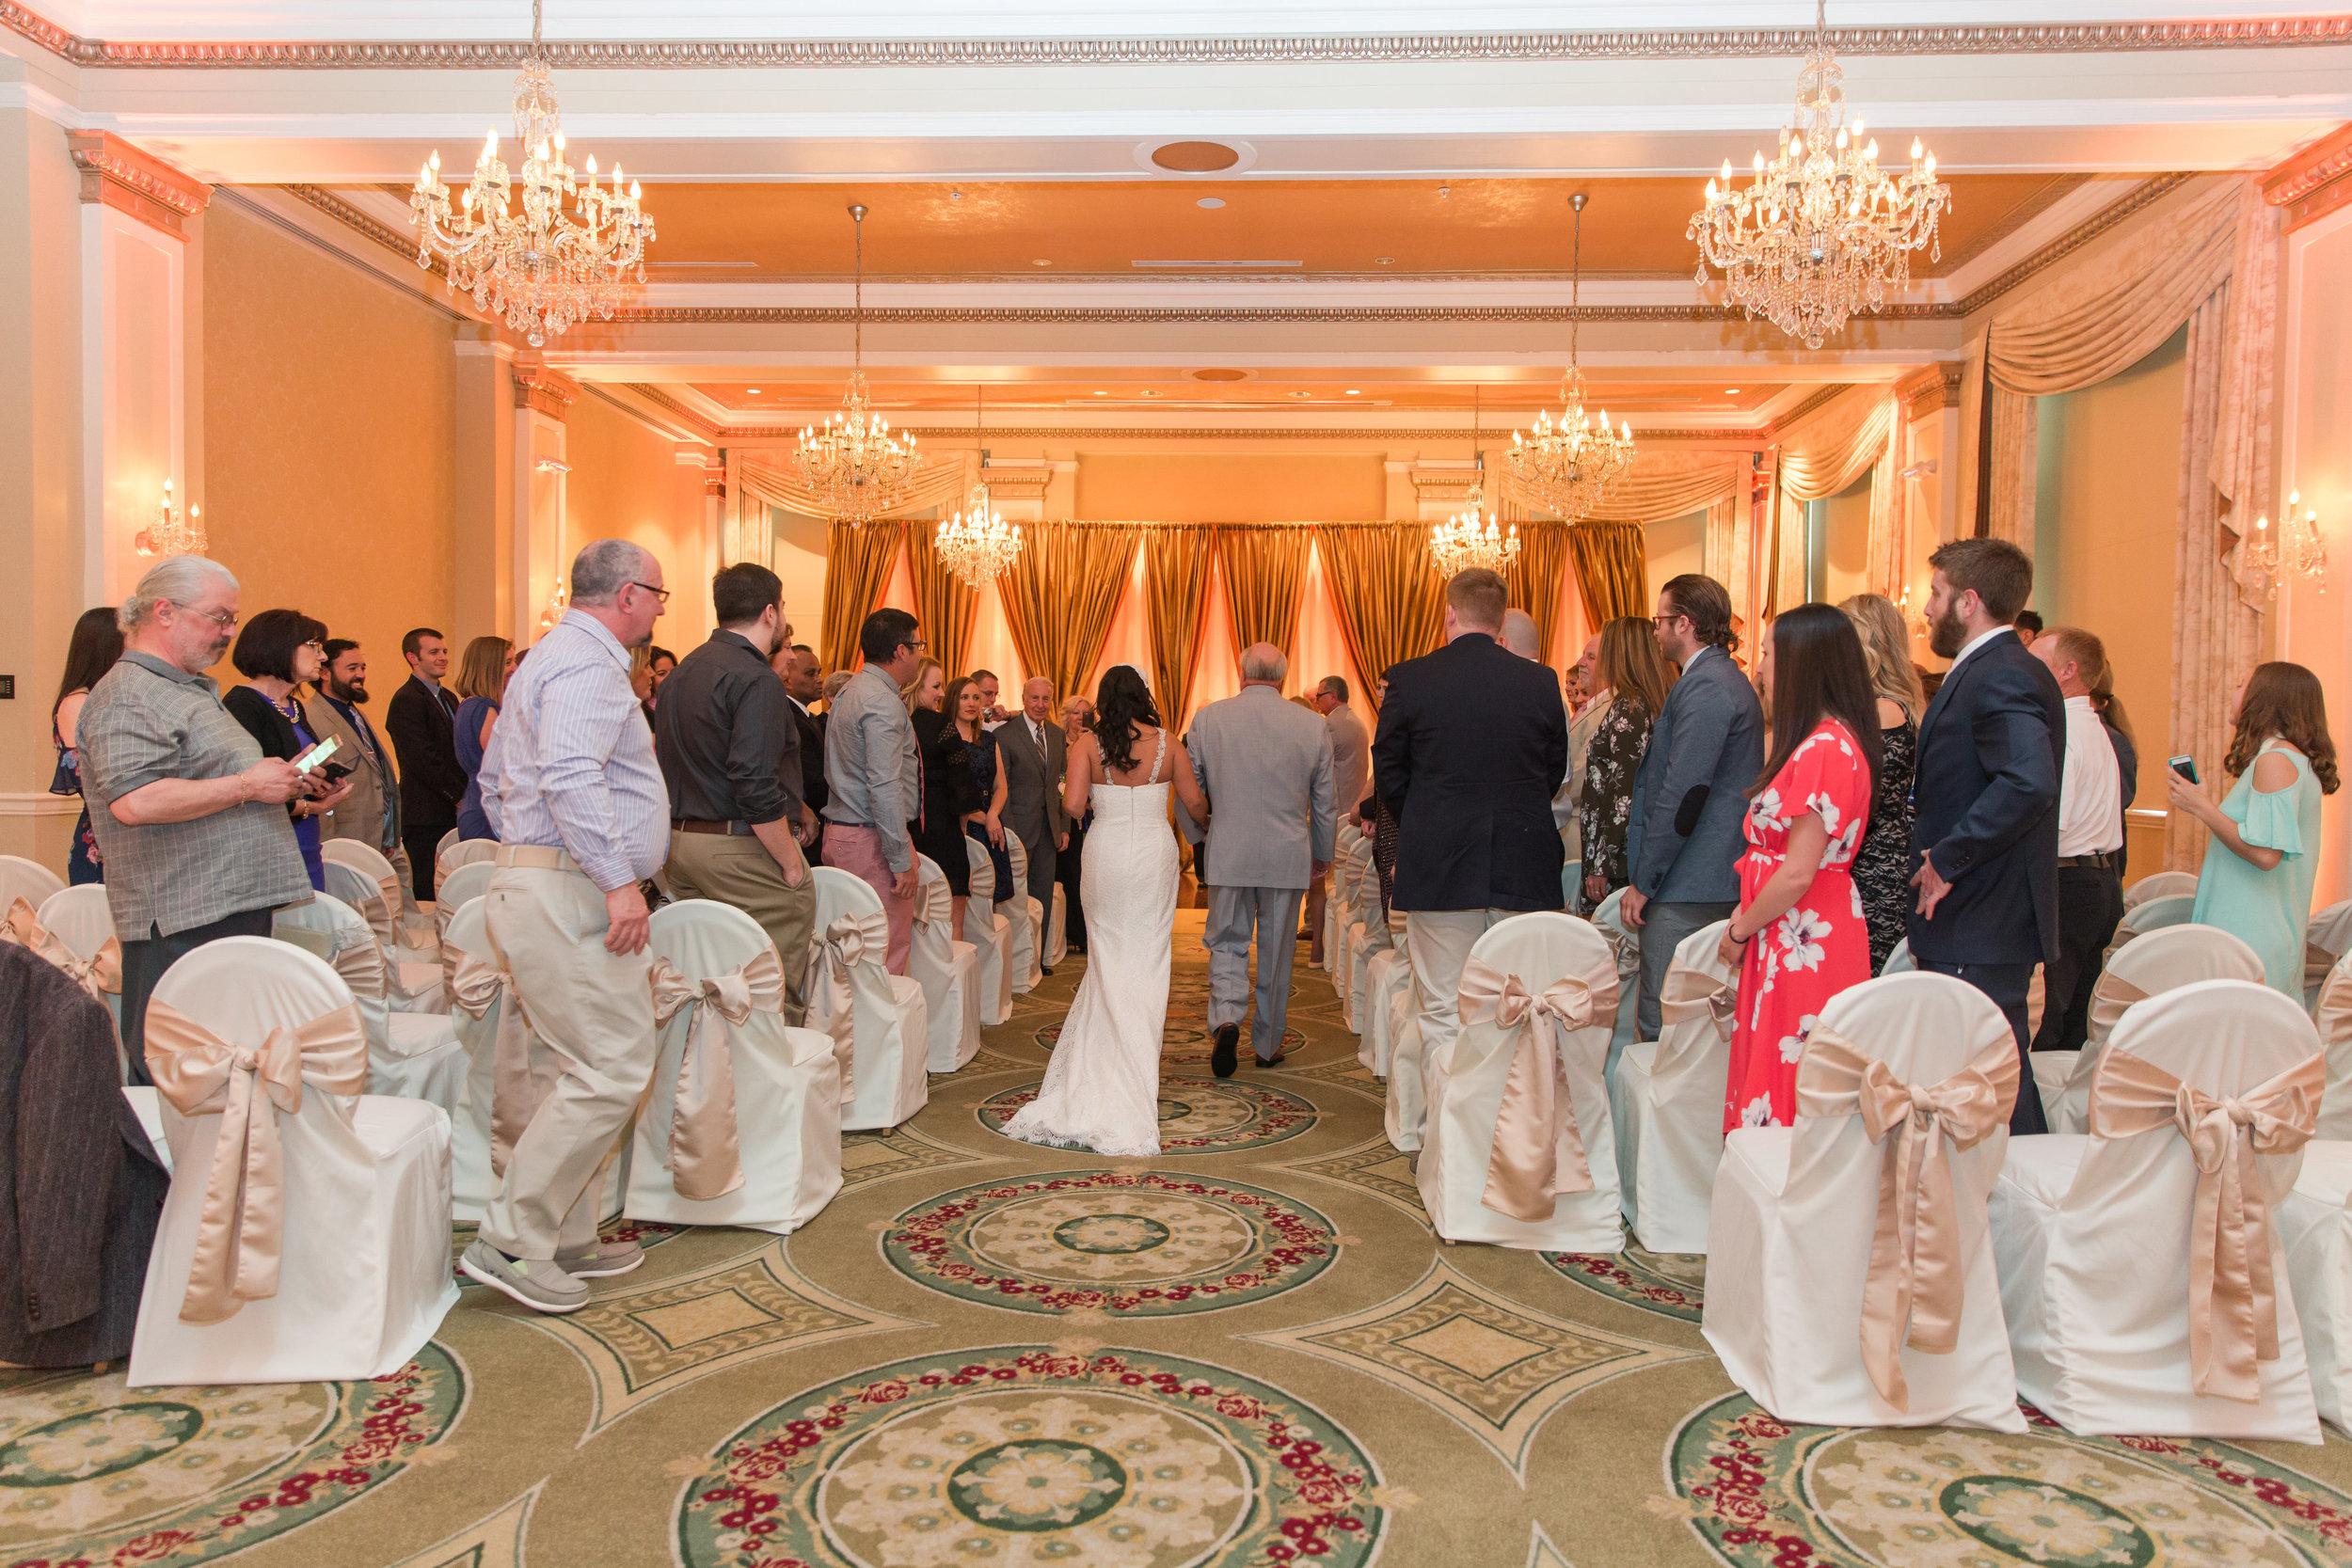 A Classic George Washington Hotel Wedding - Photography by Marirosa